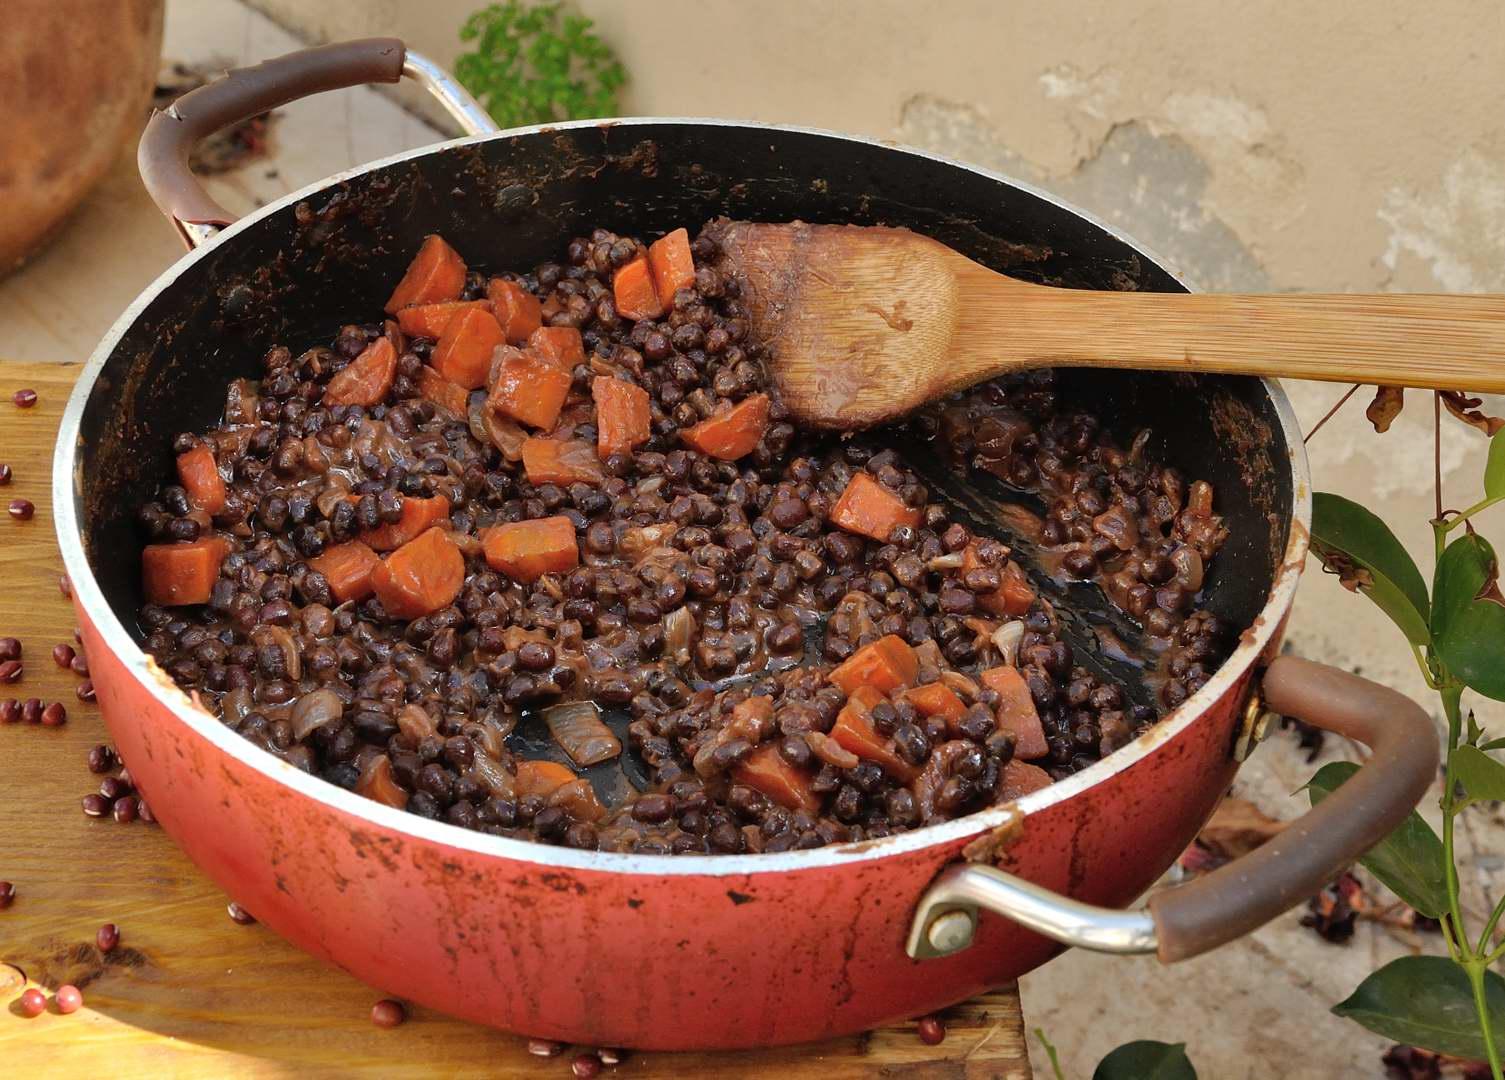 How to Cook Adzuki Beans